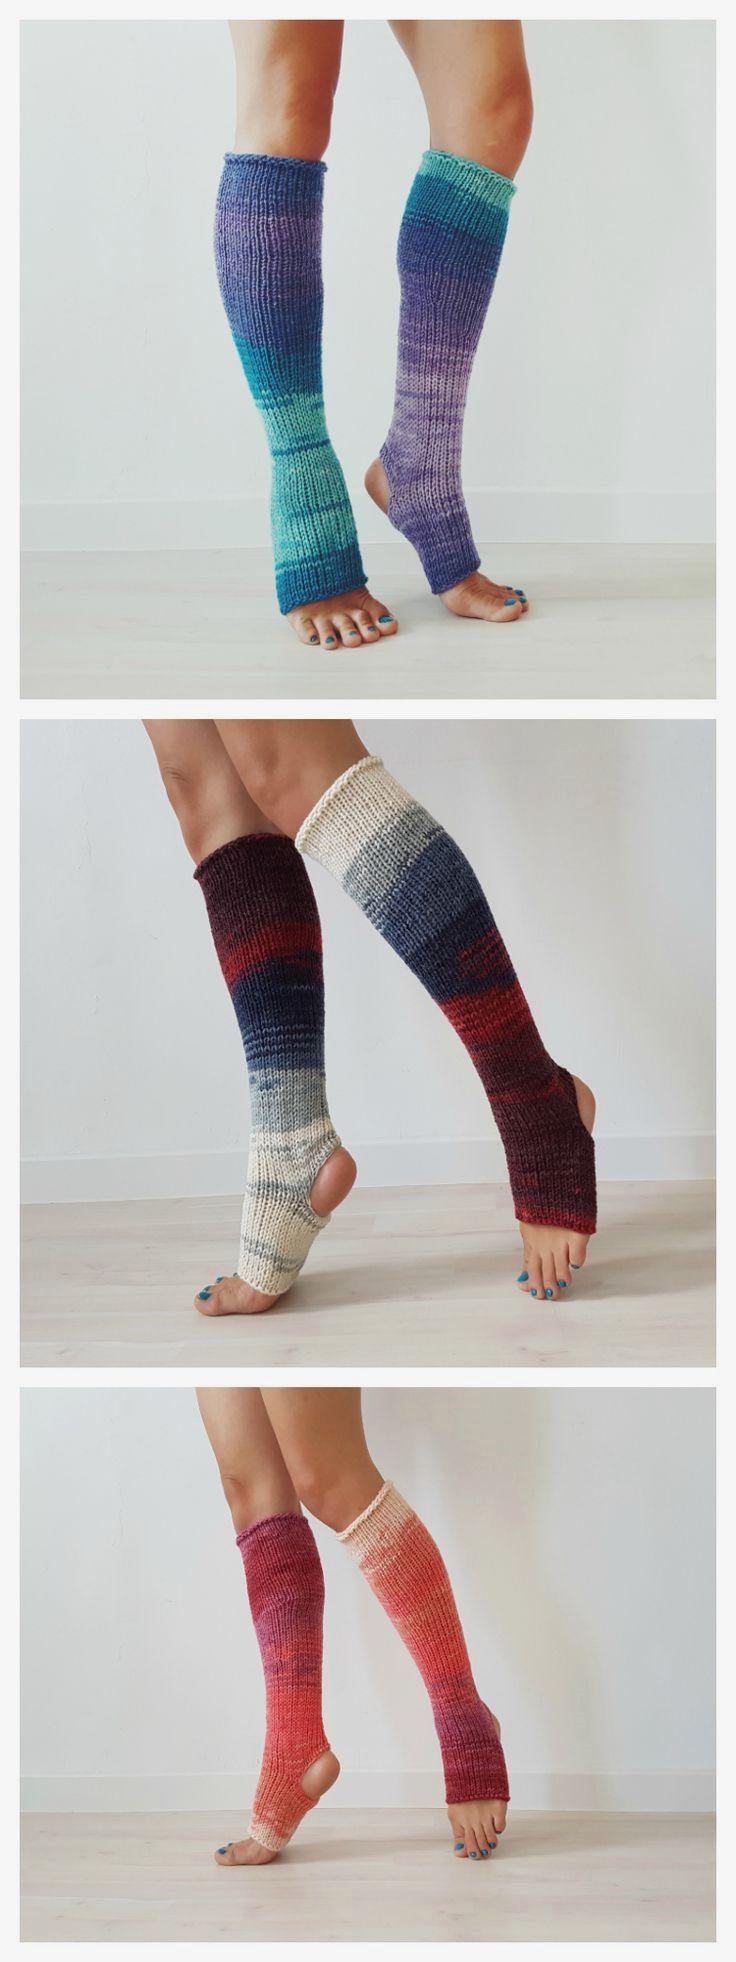 Atractivo Crochet Patrón De Calcetines Toeless Imagen - Ideas de ...